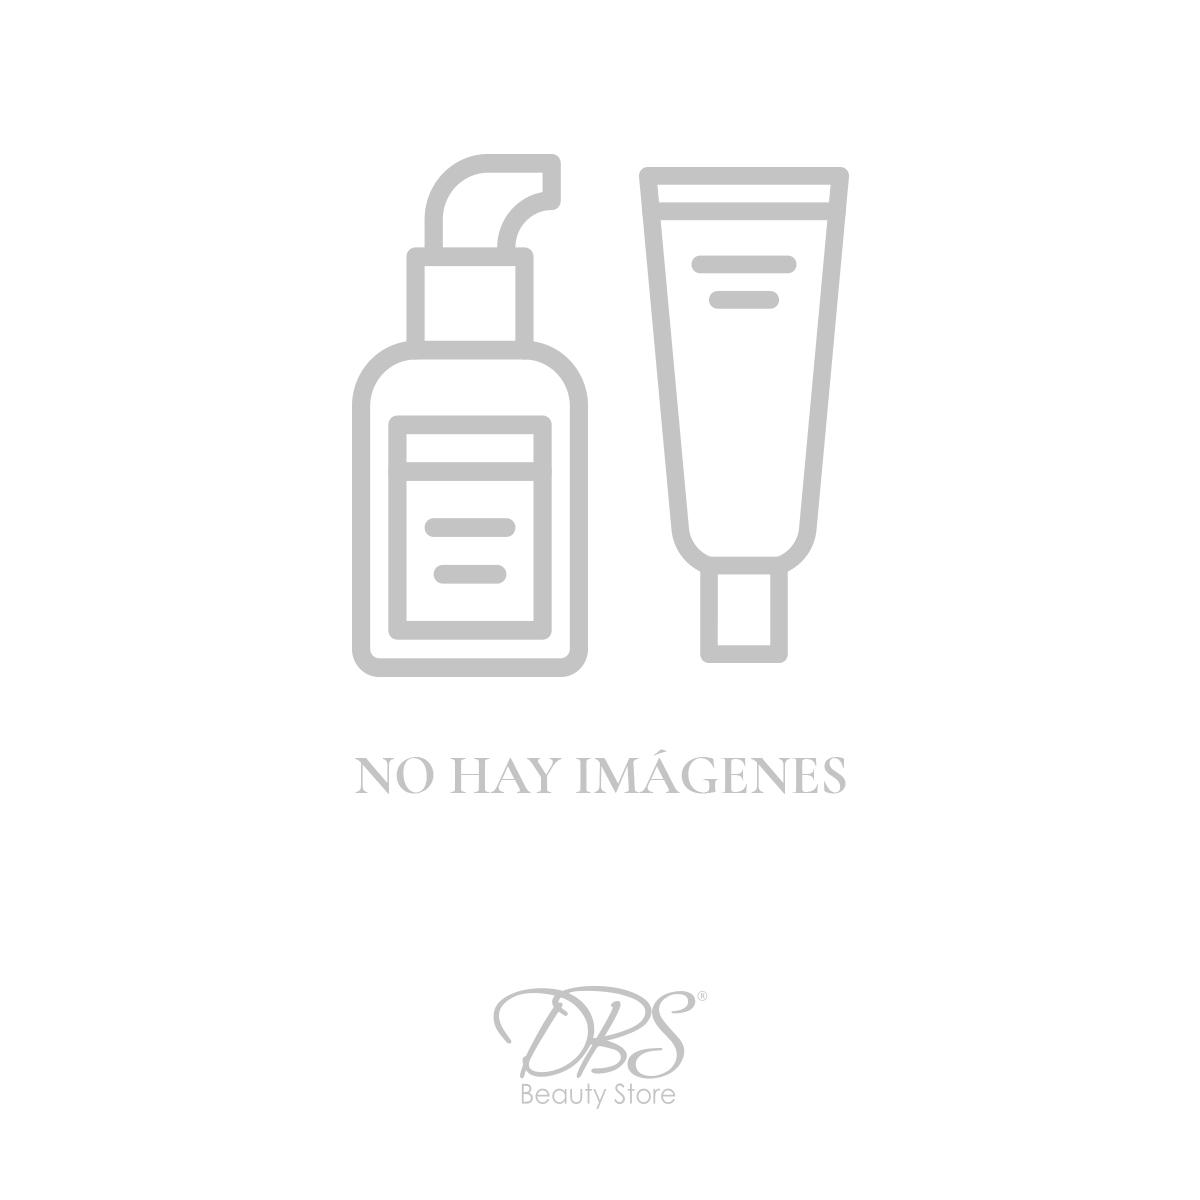 body-luxuries-BL-BN08532.jpg